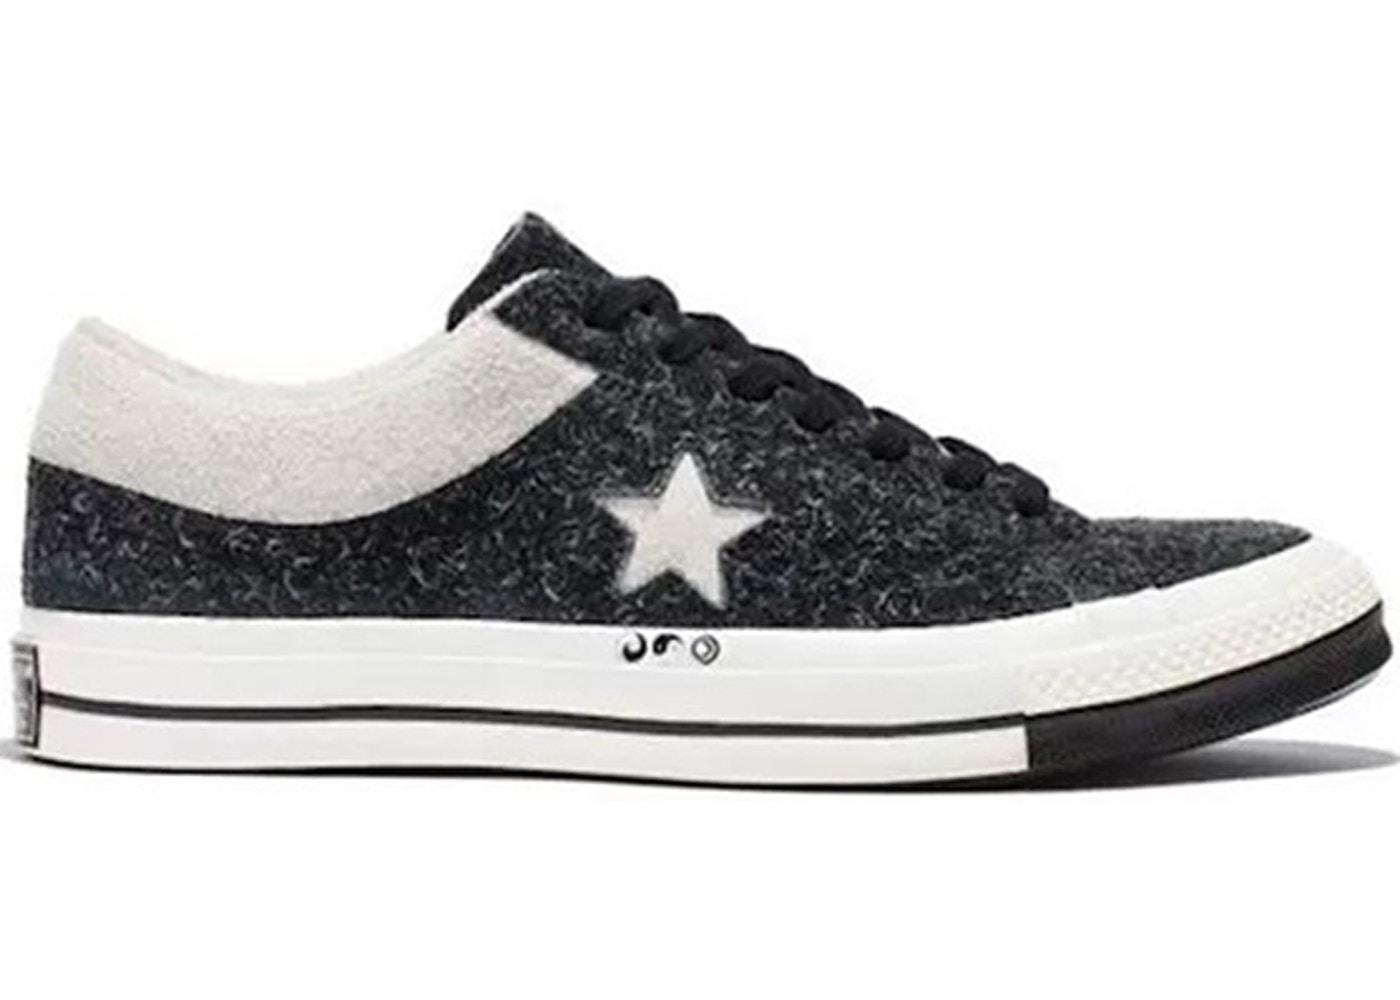 ef5ca1fea8f8 Converse One Star Ox Clot Black White - 159248C